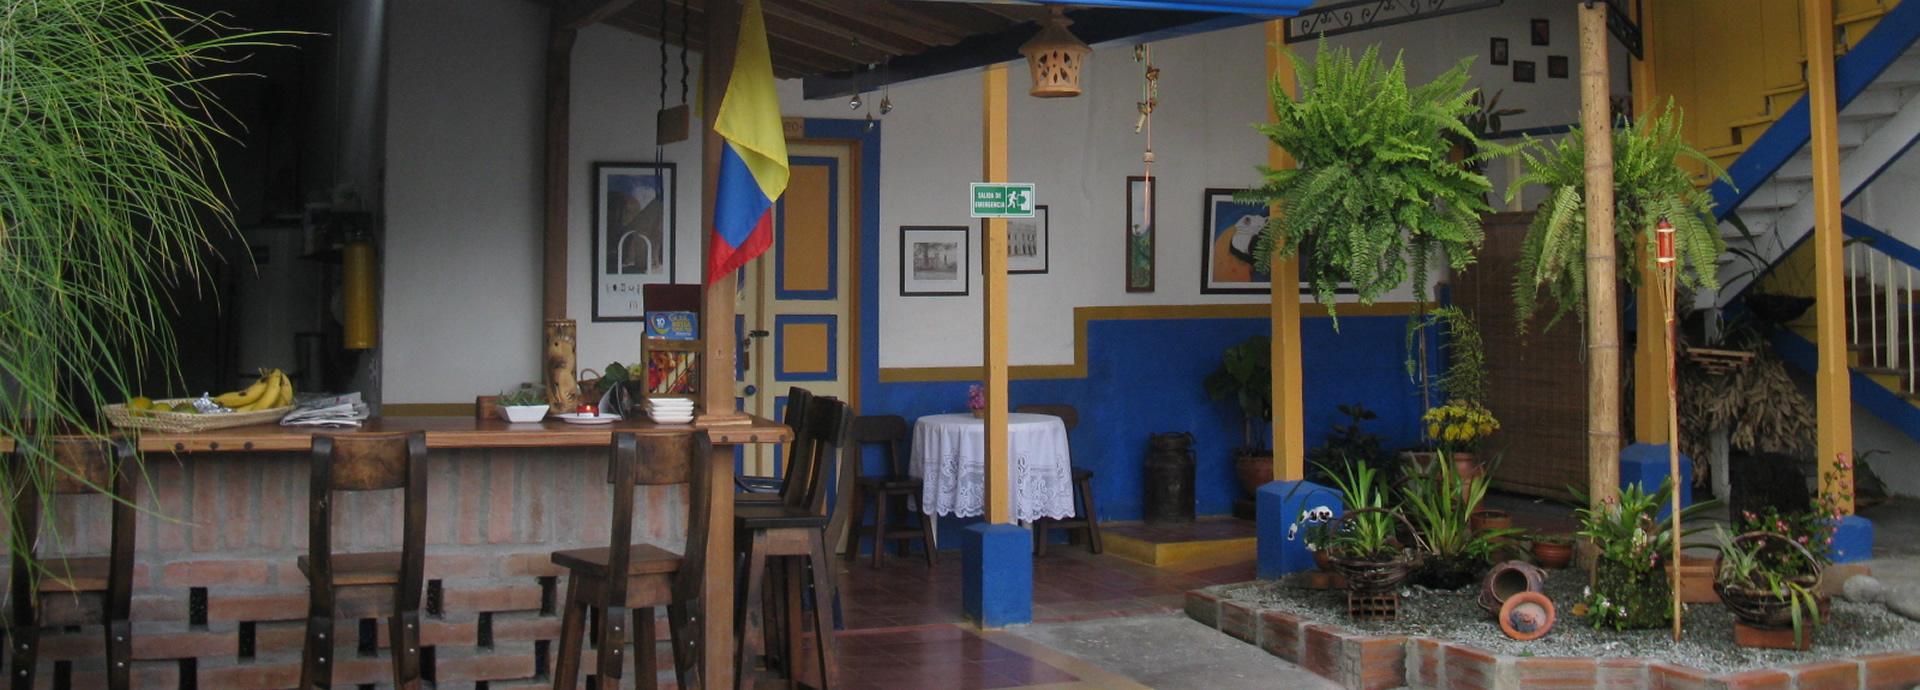 hostal_ciudad_segorbe_2